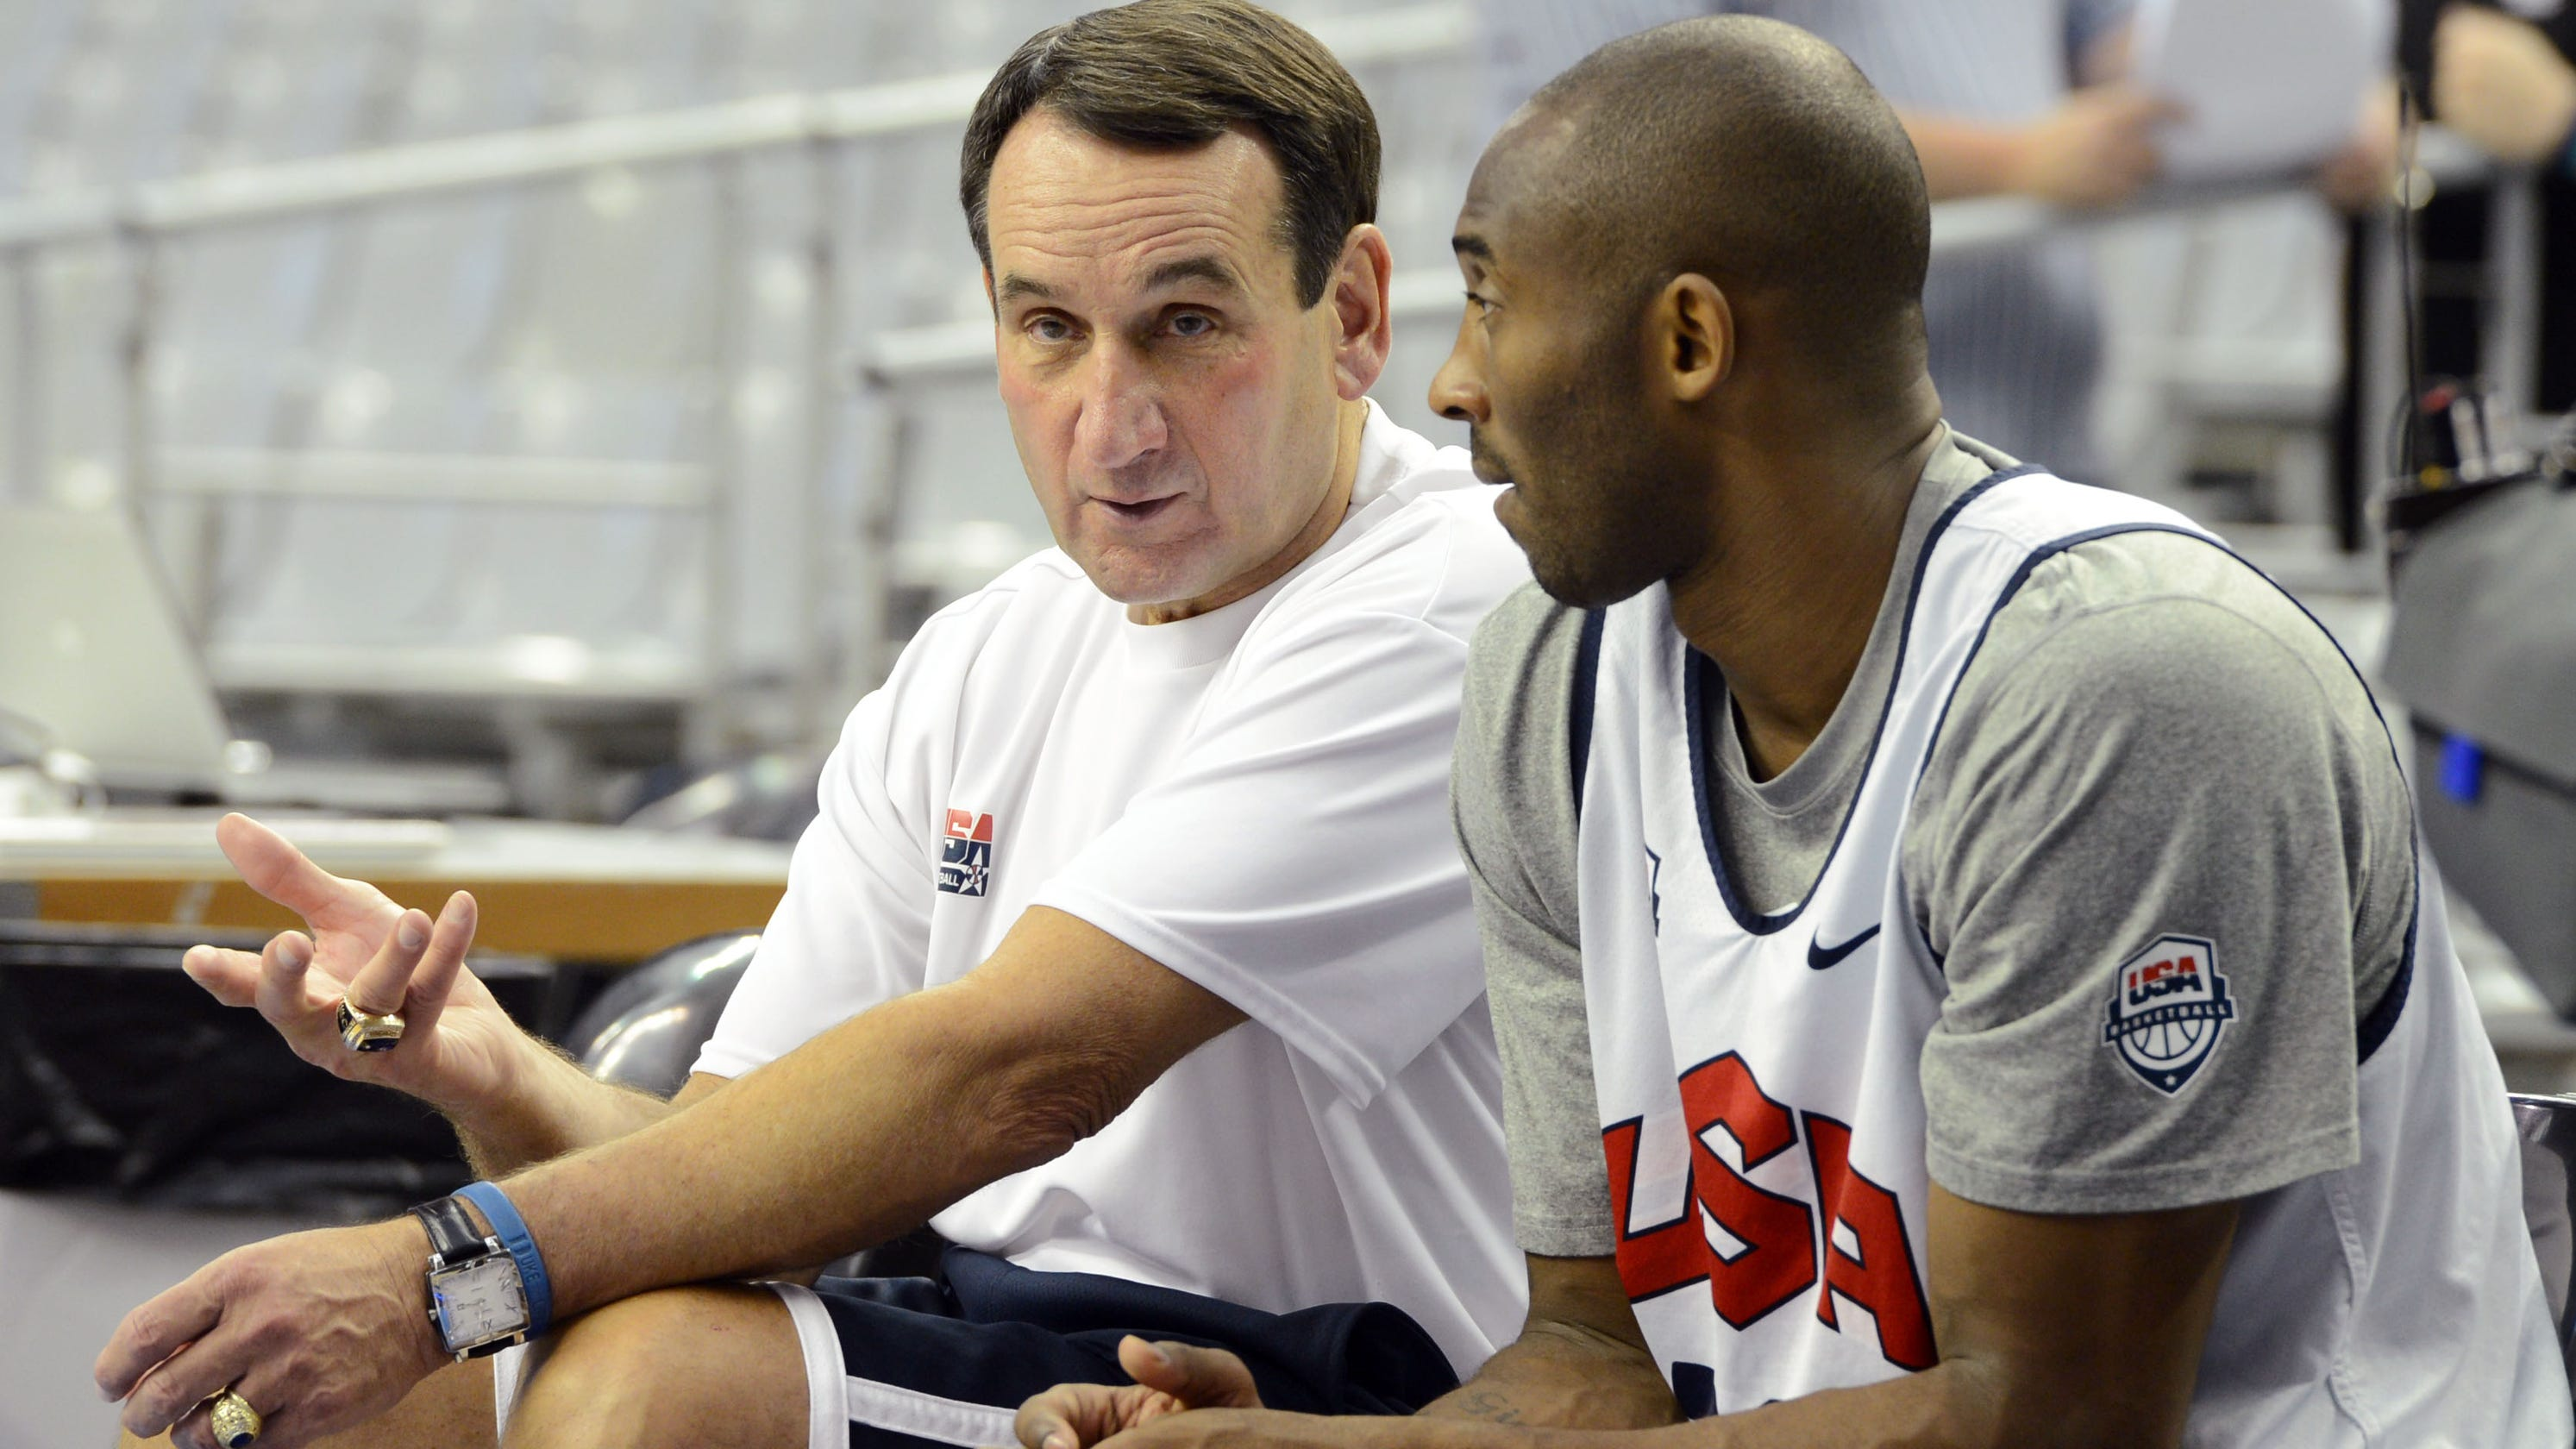 Barack Obama, LeBron James, NBA luminaries share their favorite Kobe Bryant memories